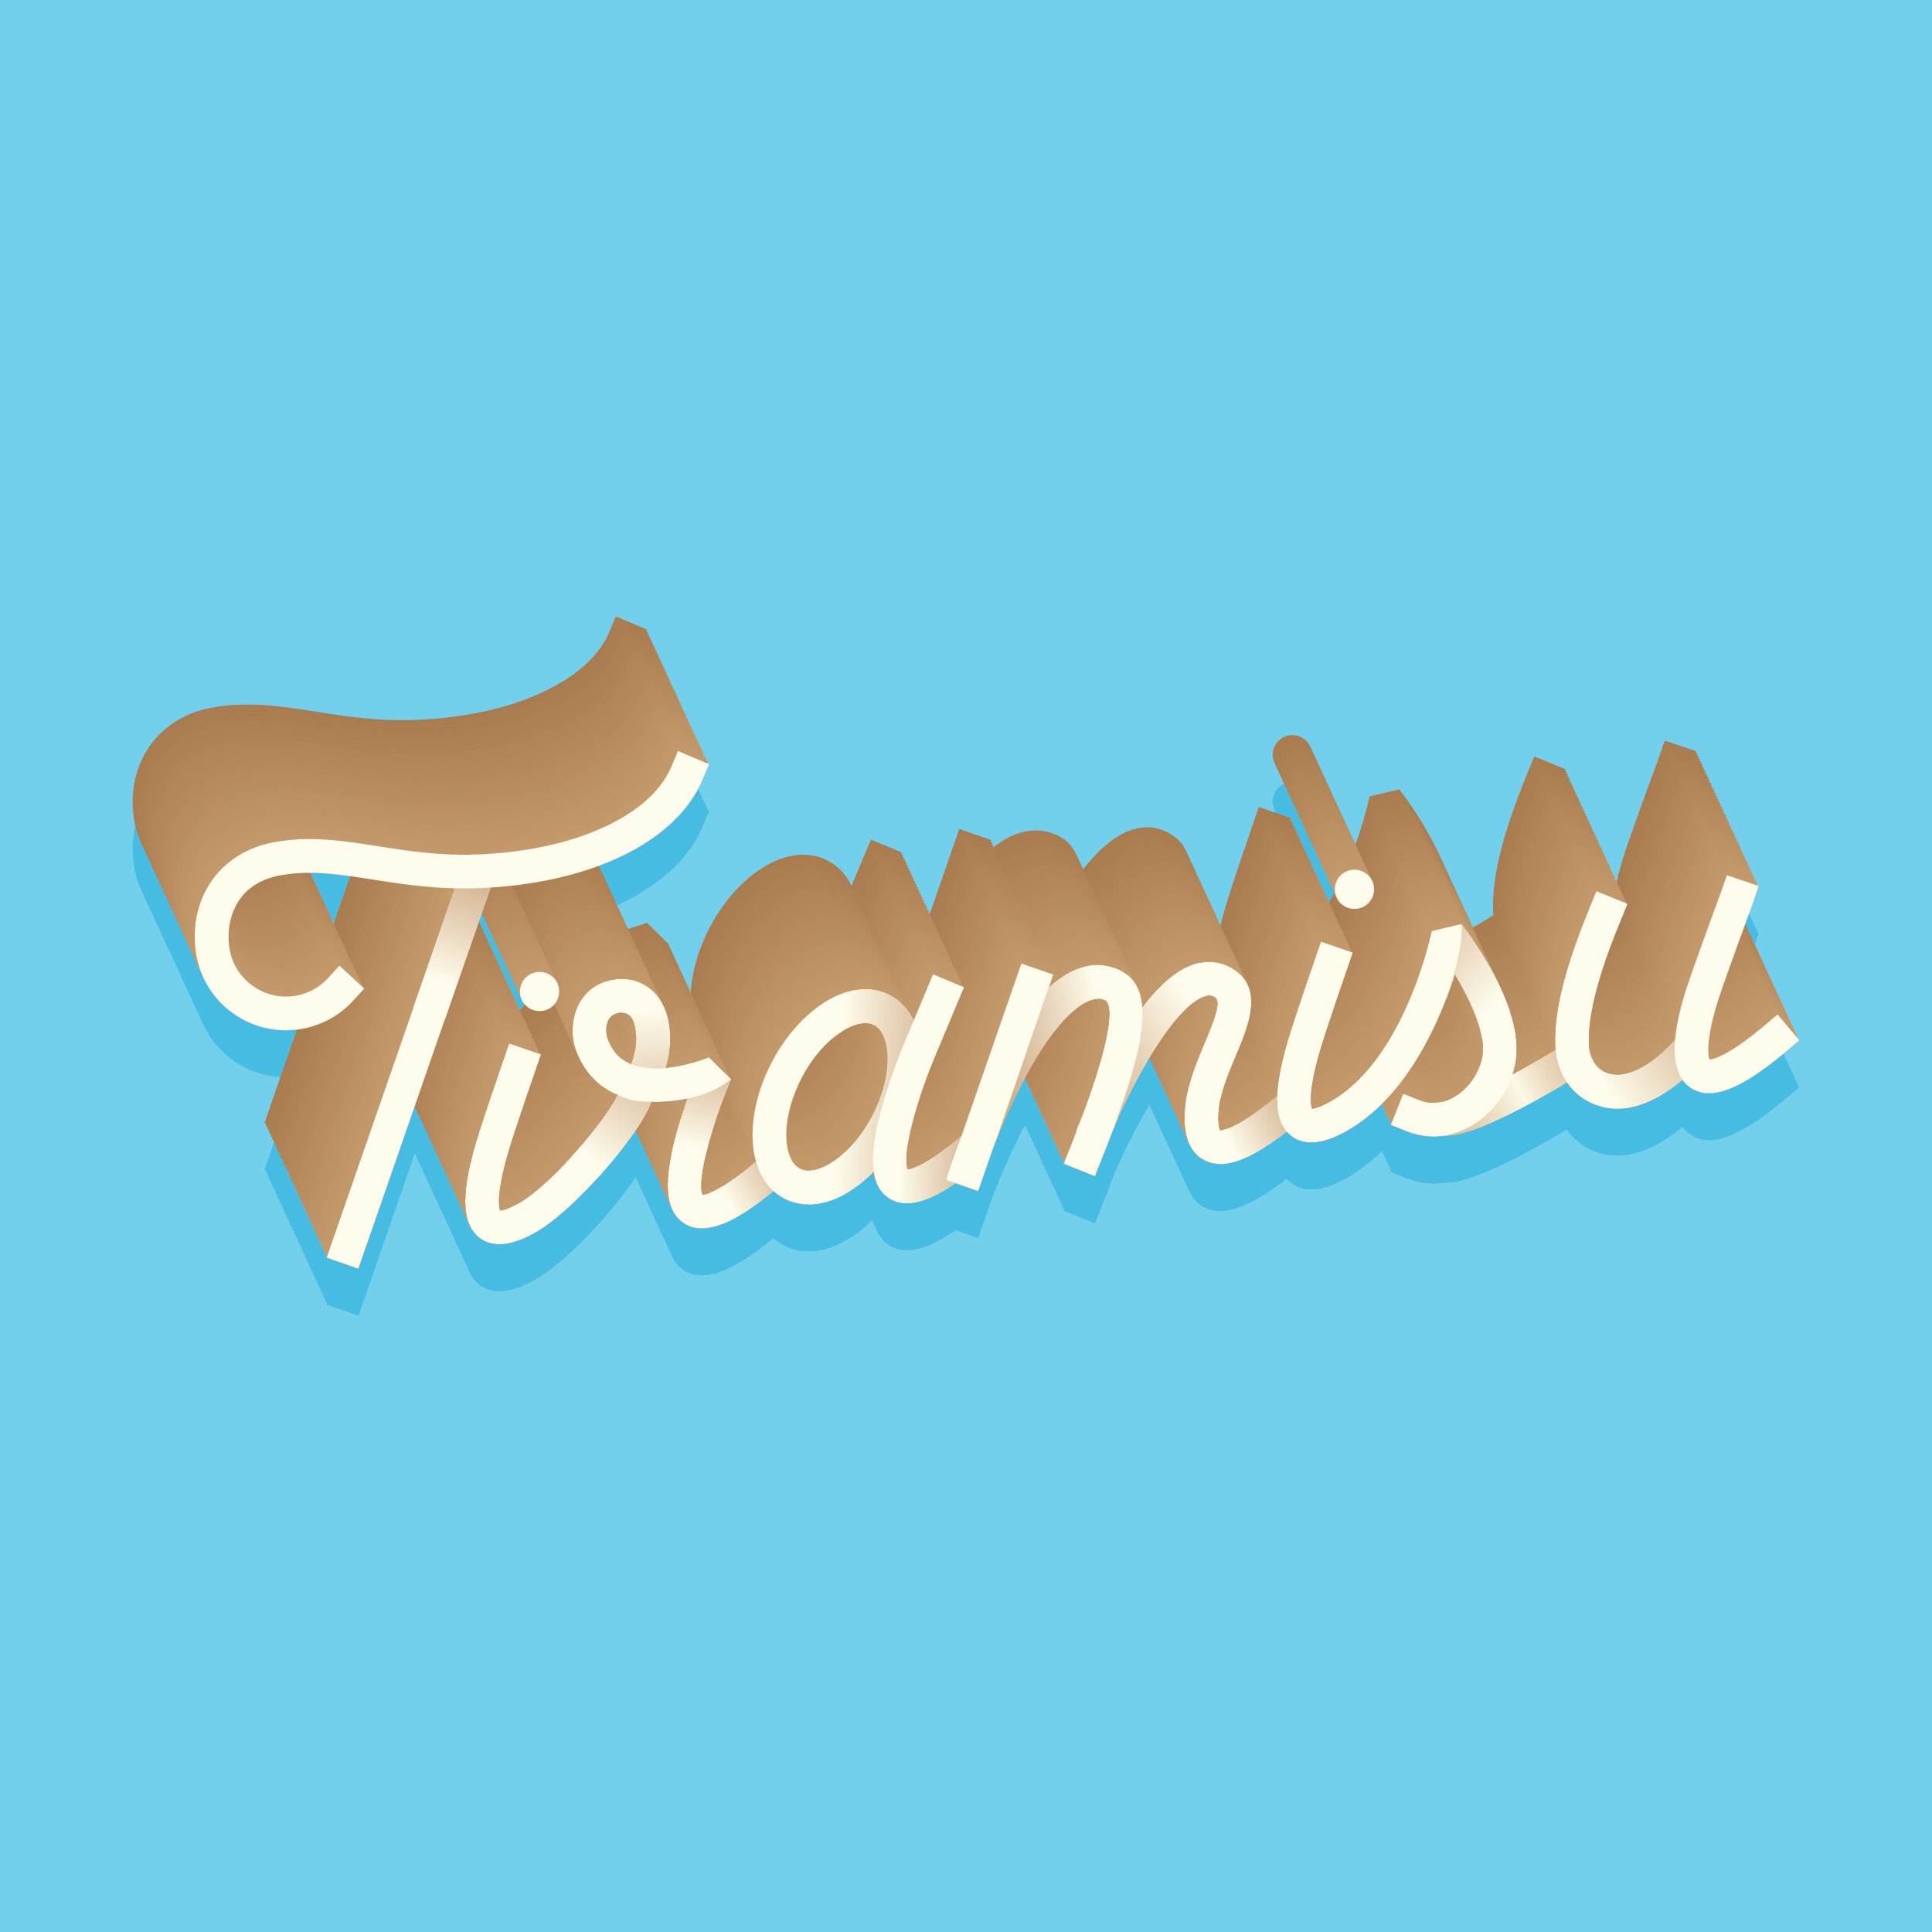 Tiramisu-01.jpg